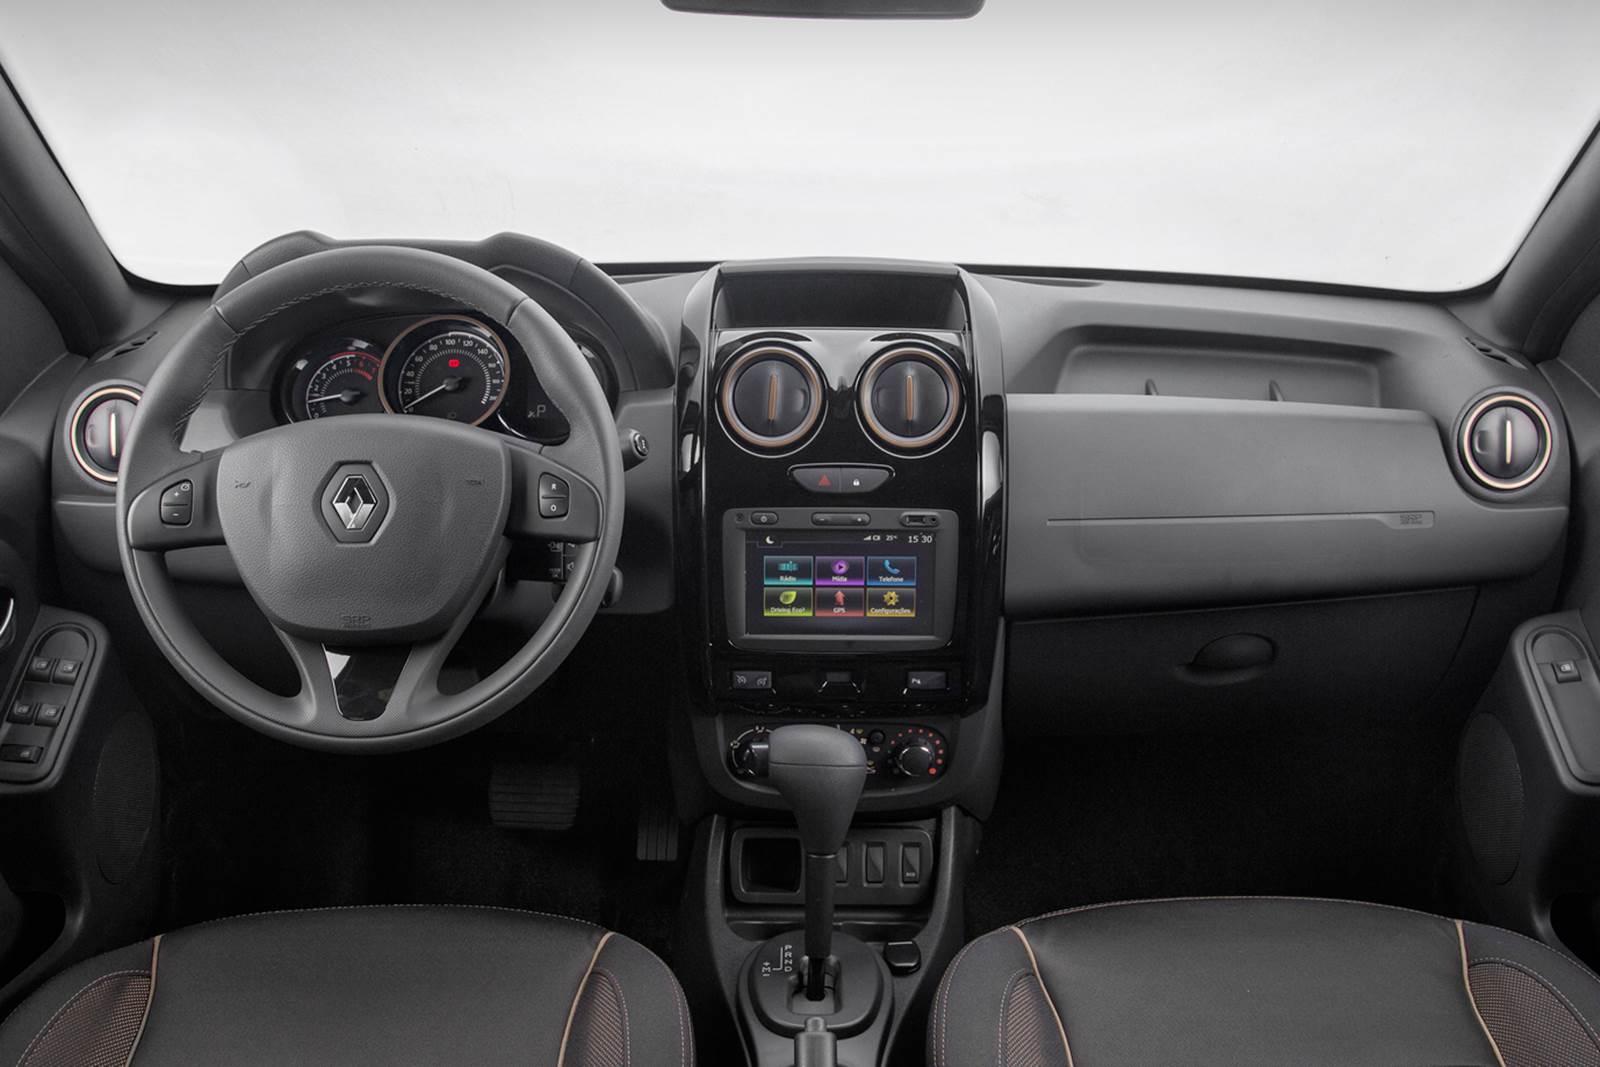 Novo Renault Duster 2016 - interior